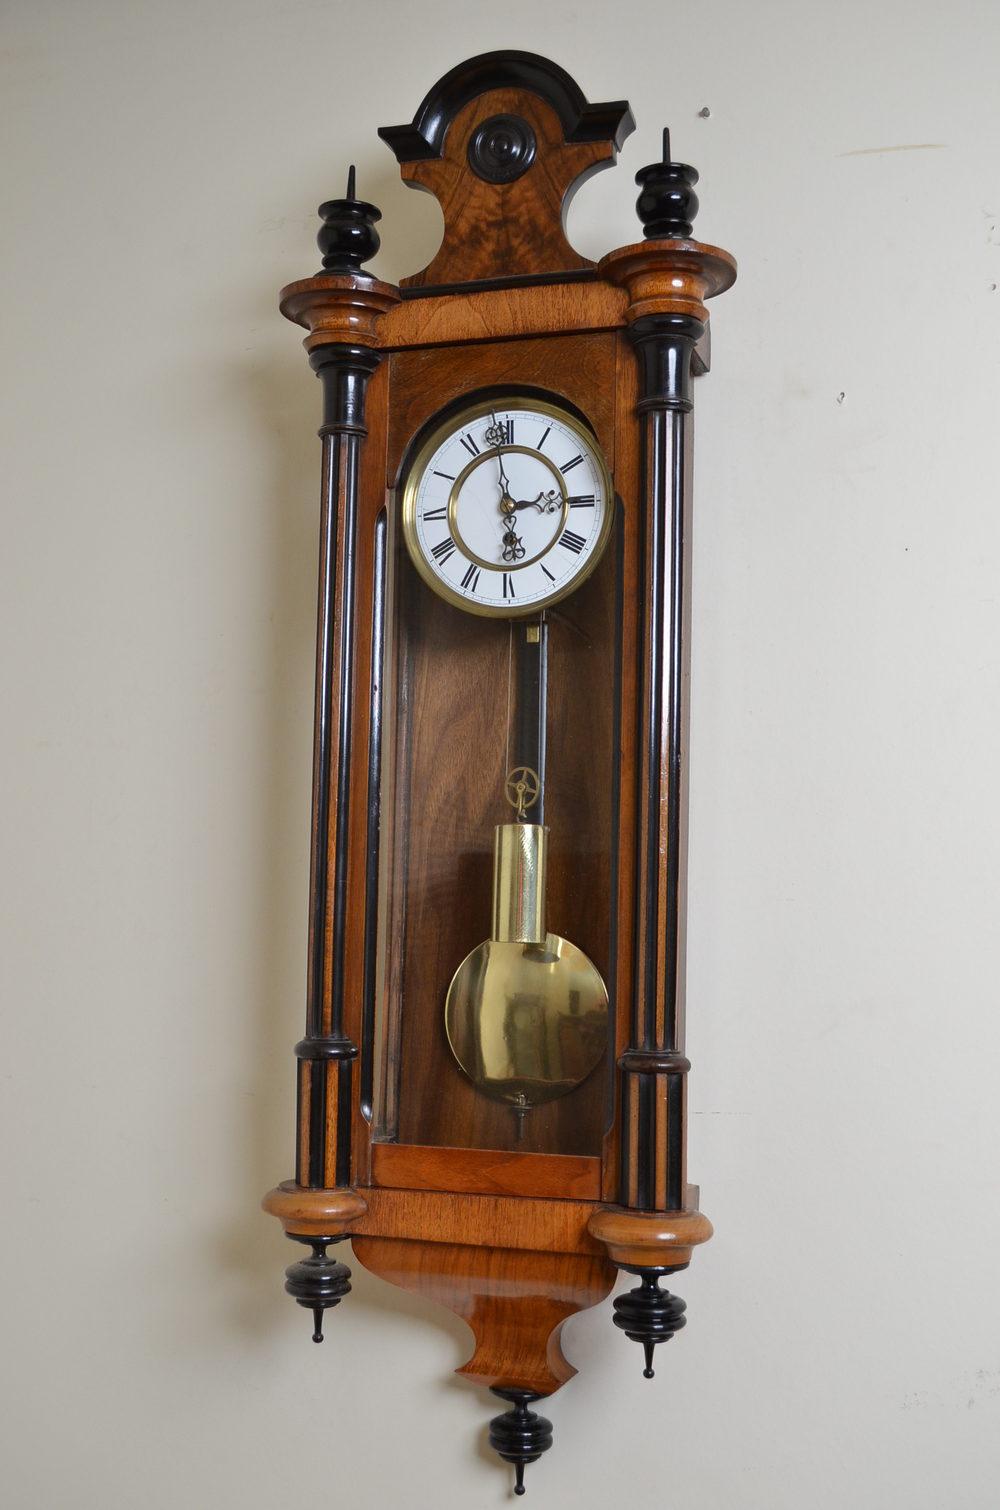 Antiques atlas victorian vienna clock in walnut victorian vienna clock in walnut antique vienna wall clocks amipublicfo Choice Image